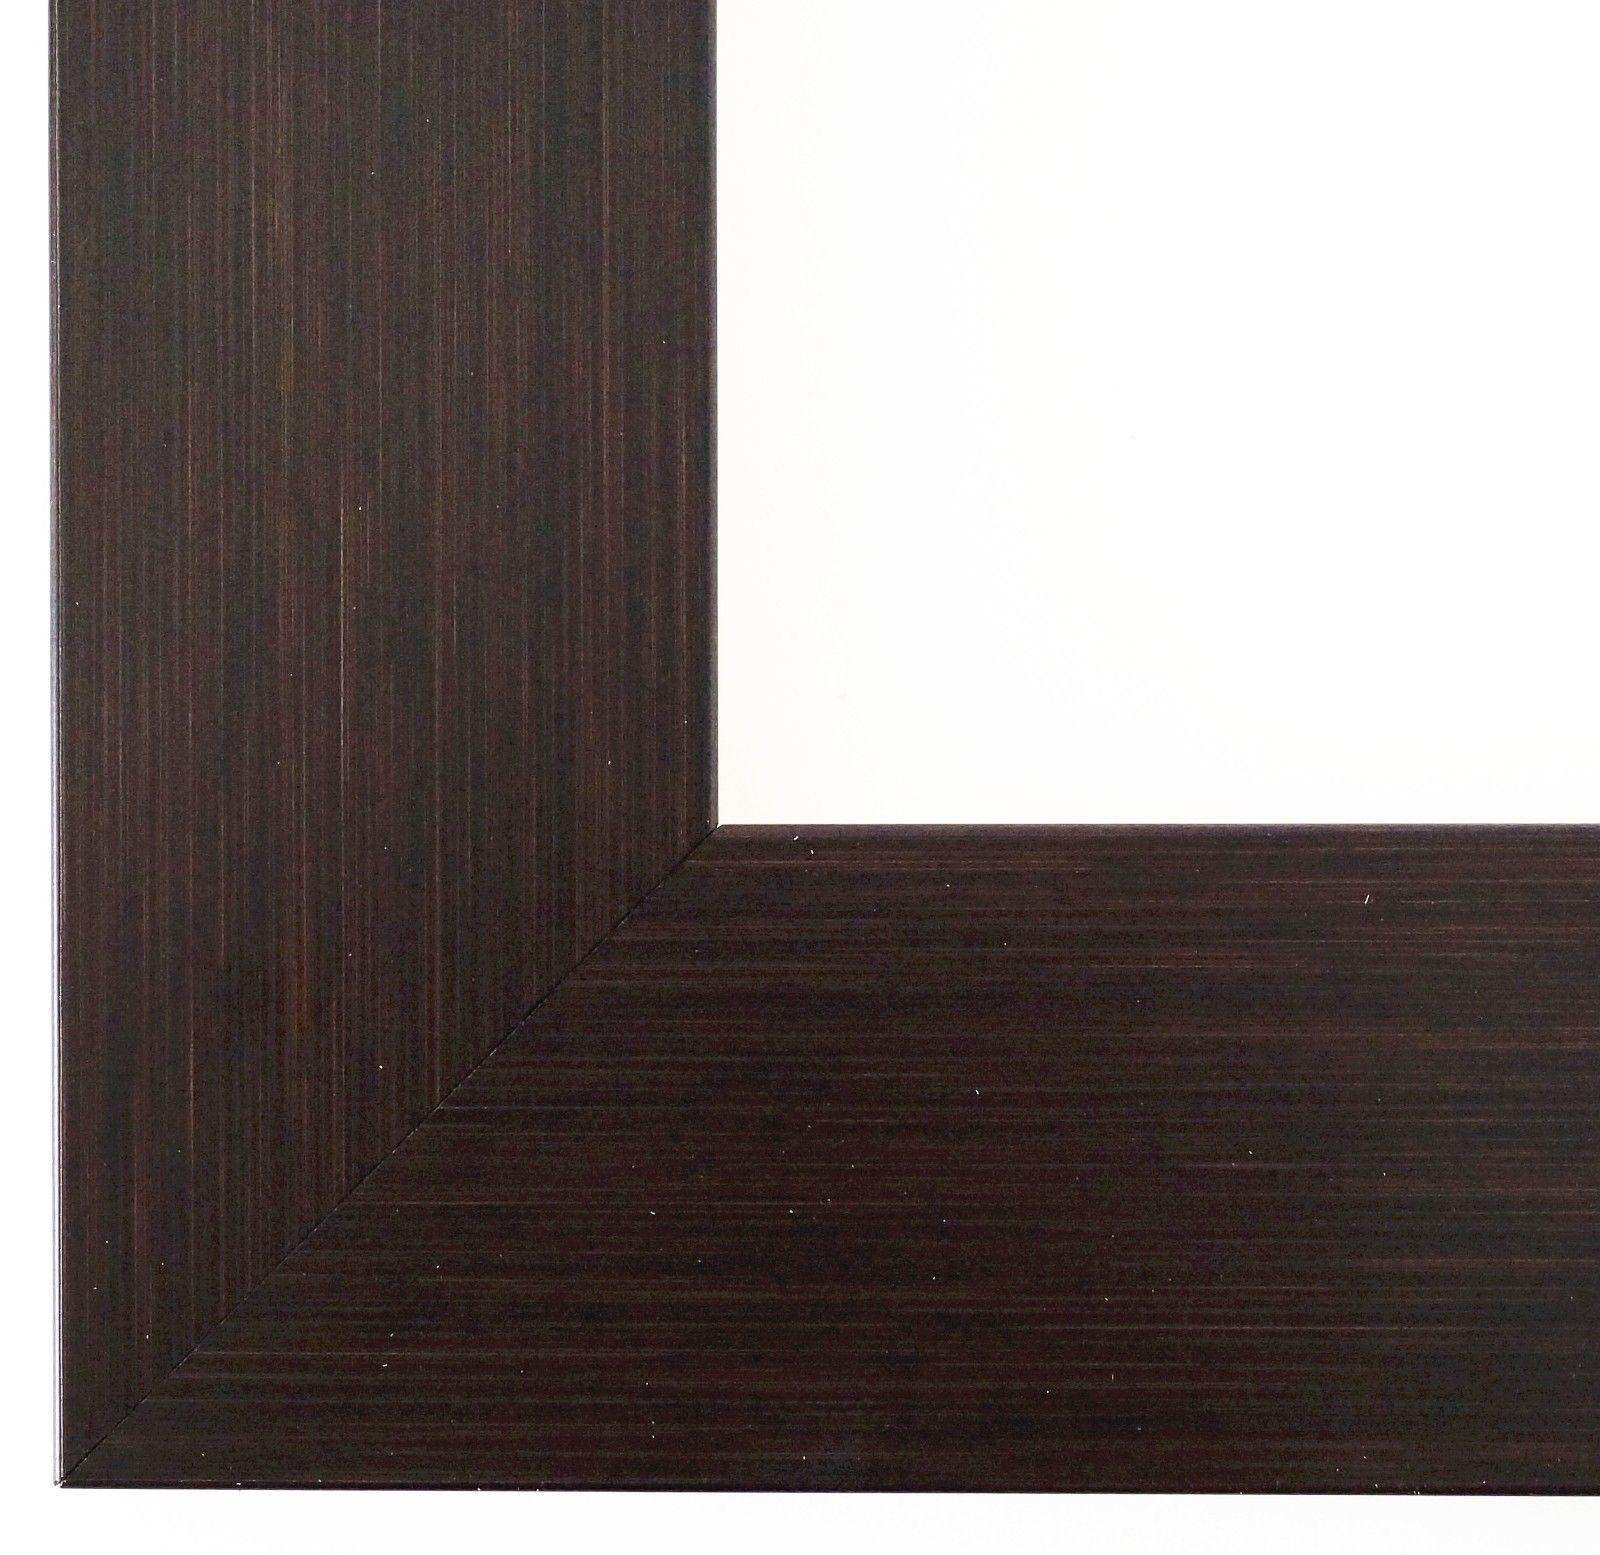 bilderrahmen din a1 bilderrahmen valencia din a1 din a2 din a3 din a4 din a0 bilderrahmen. Black Bedroom Furniture Sets. Home Design Ideas